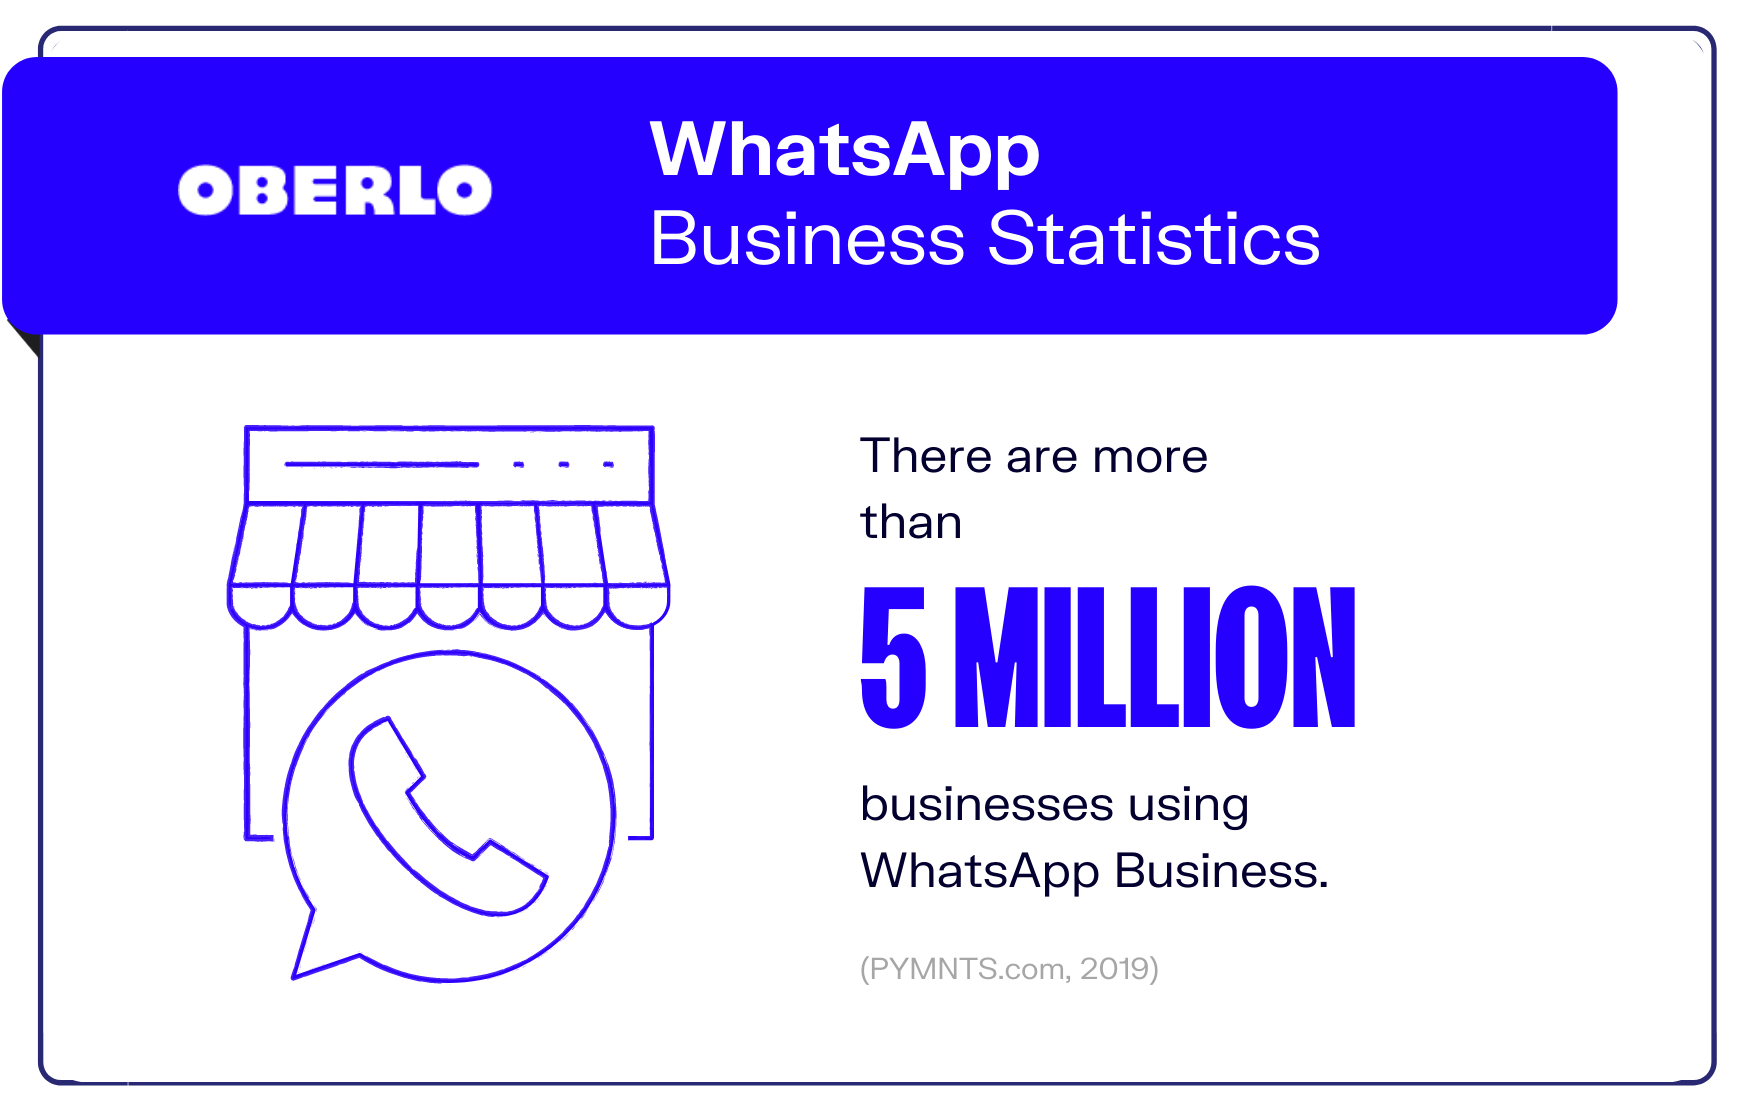 graphic of whatsapp statistic #9